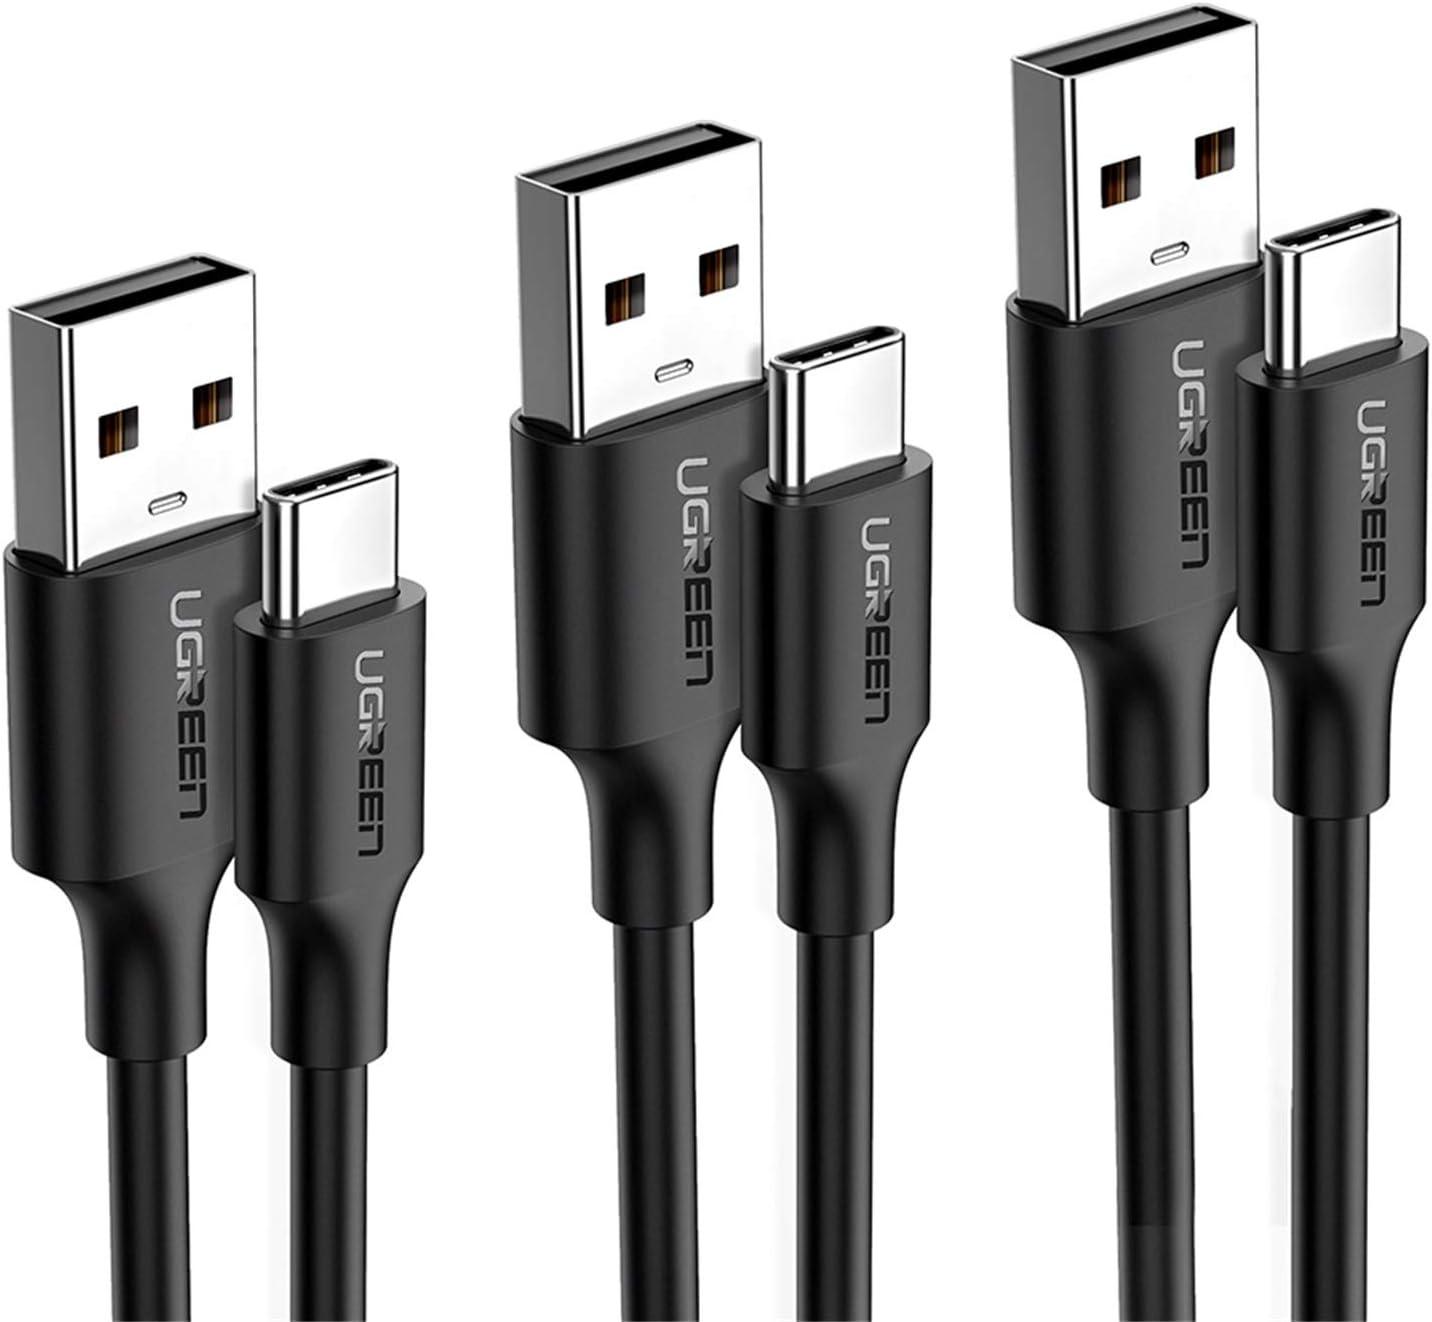 UGREEN Cable USB Tipo C, 0,5M+1M+2M(3 Pack) 3A Cargador Tipo C PVC Carga Rápida y Sincronización Cable USB C para Xiaomi Redmi Note 8, Mi 9, Mi A2 Lite, Samsung A50, Airpods New, iPad Pro 2018, 2020